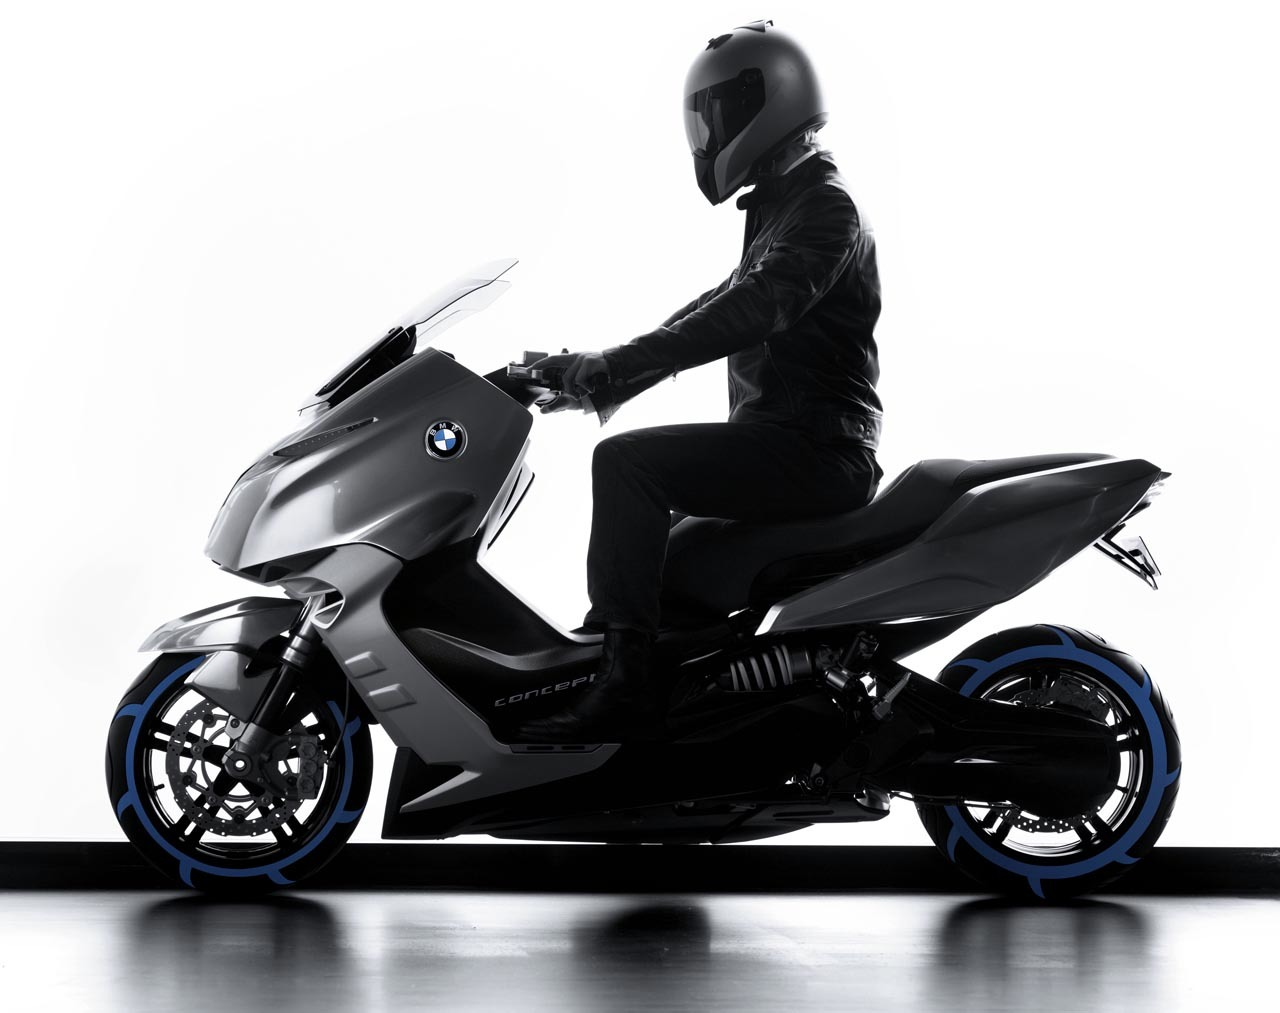 Foto de BMW Concept C Scooter, el Scooter del futuro según BMW (11/19)